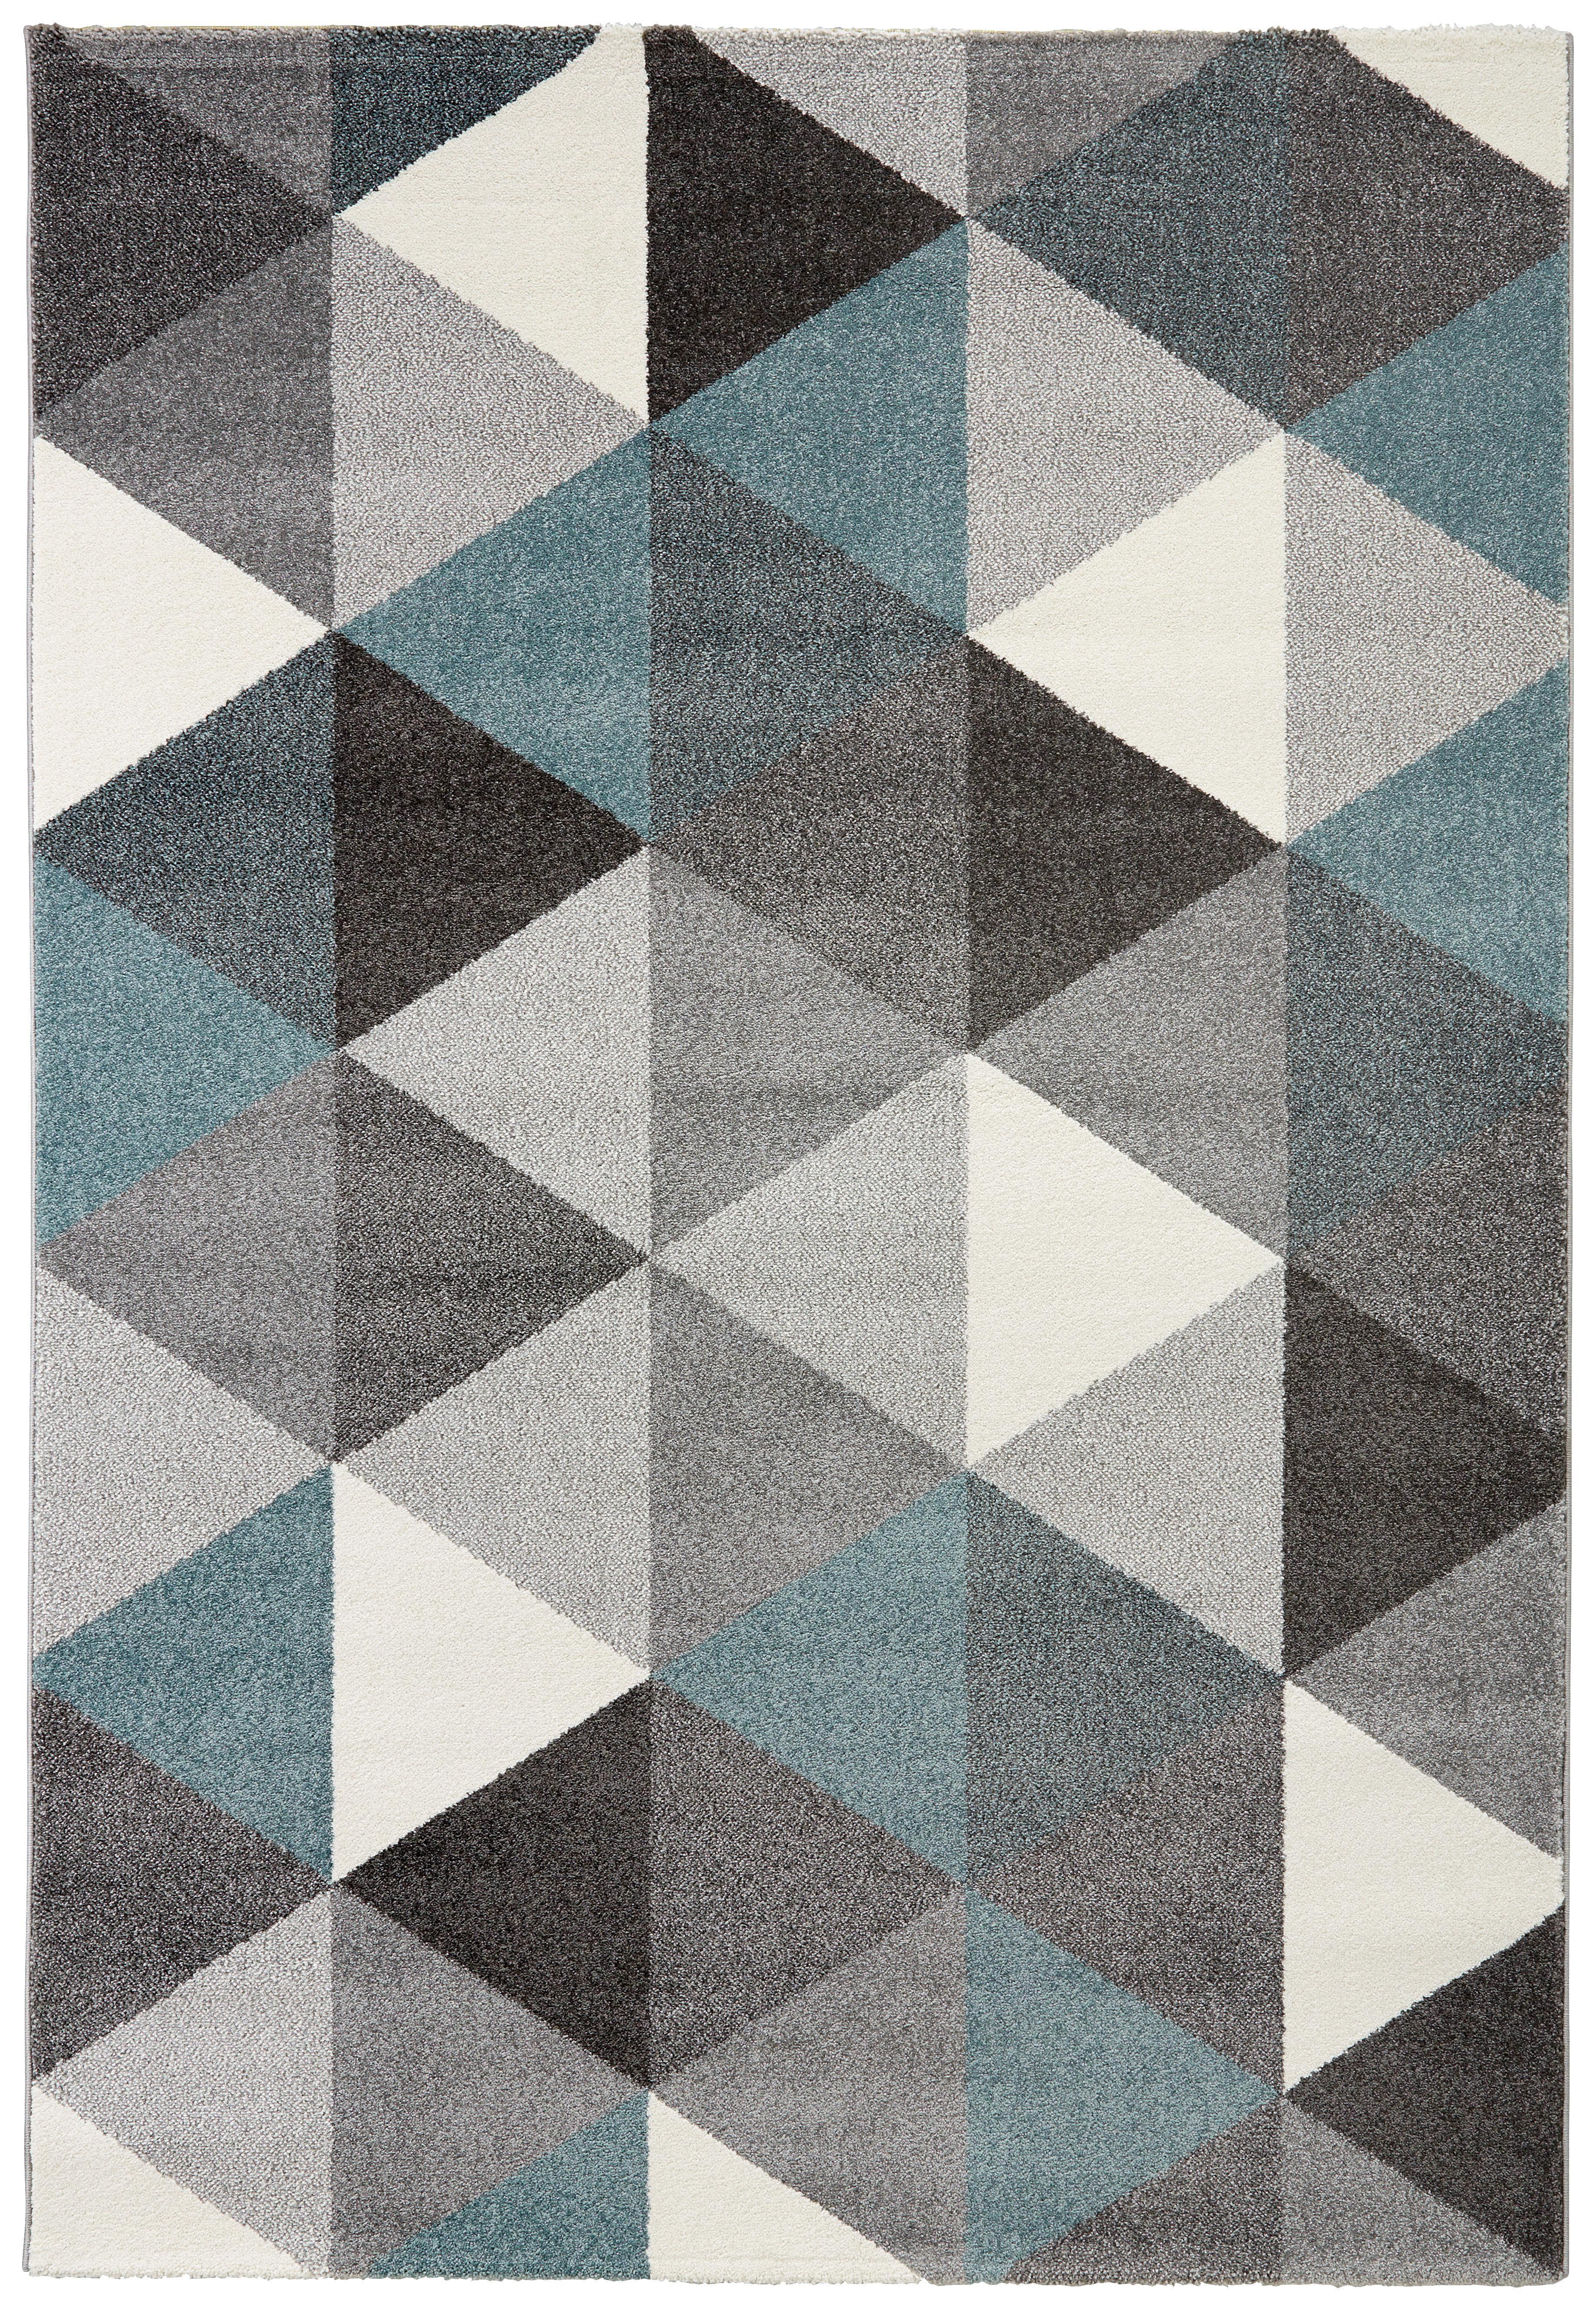 webteppich rom blau grau 120x170cm online kaufen m max. Black Bedroom Furniture Sets. Home Design Ideas